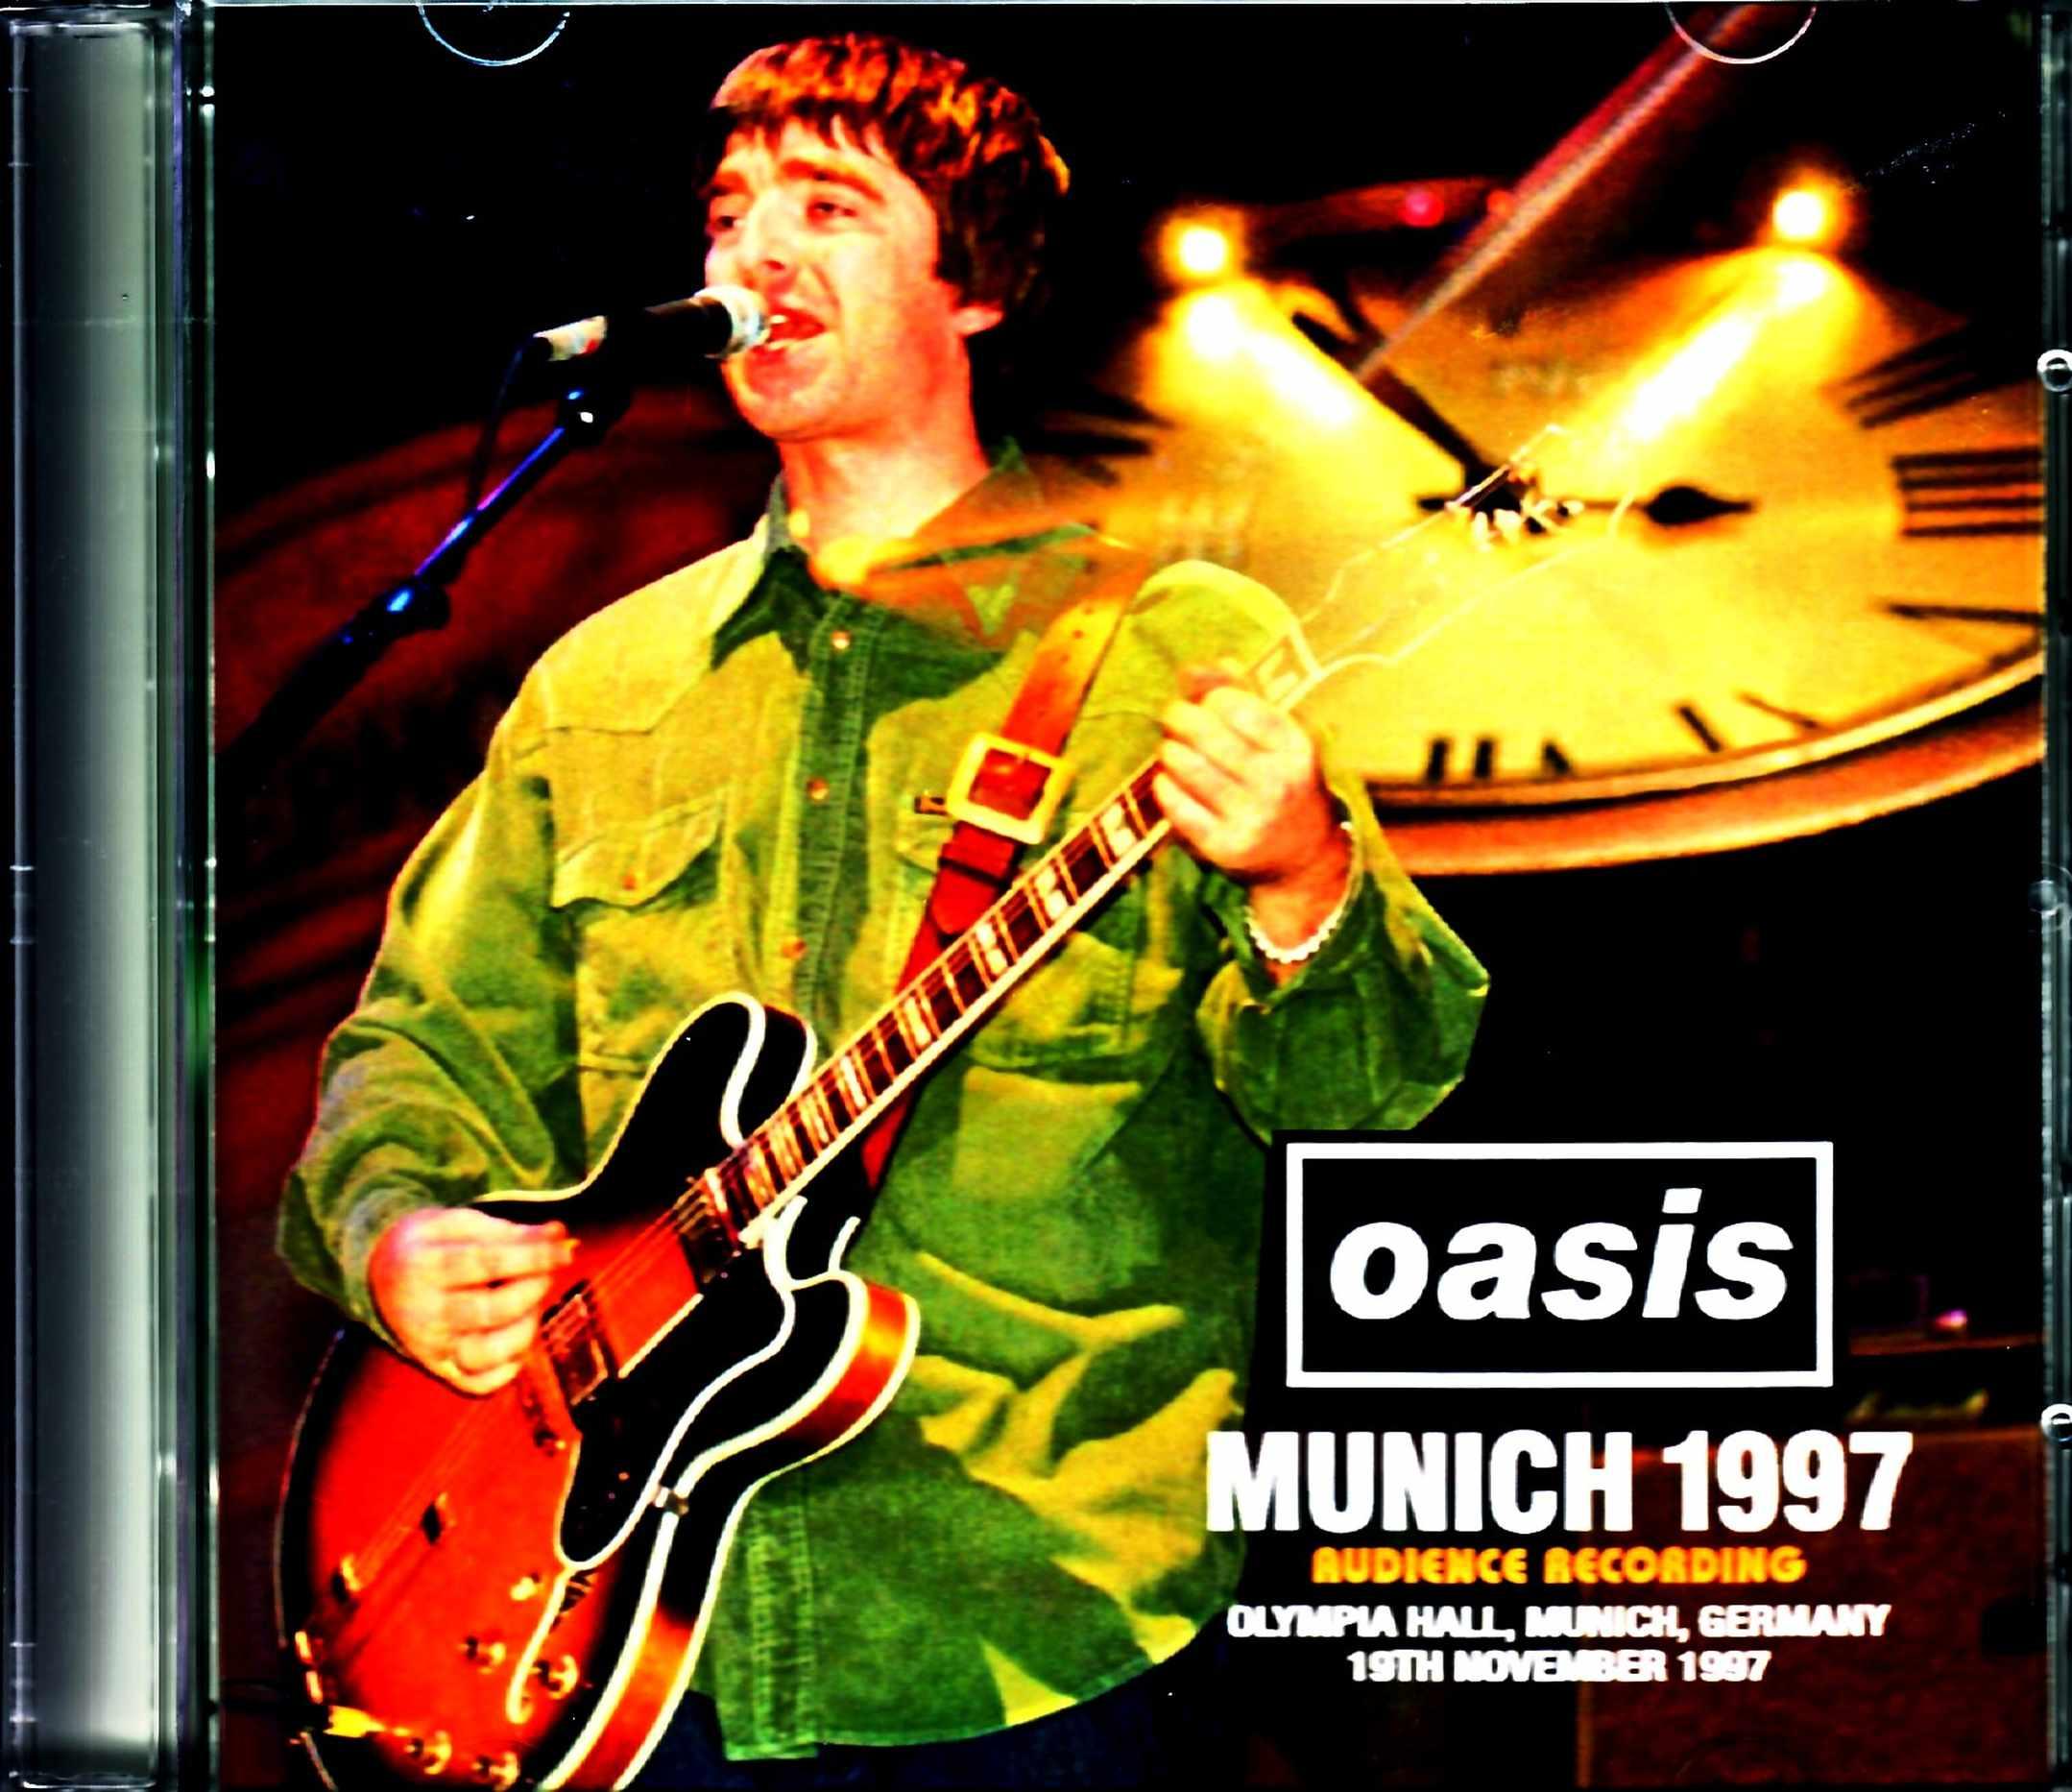 Oasis オアシス/Germany 11.19.1997 Audience Recording